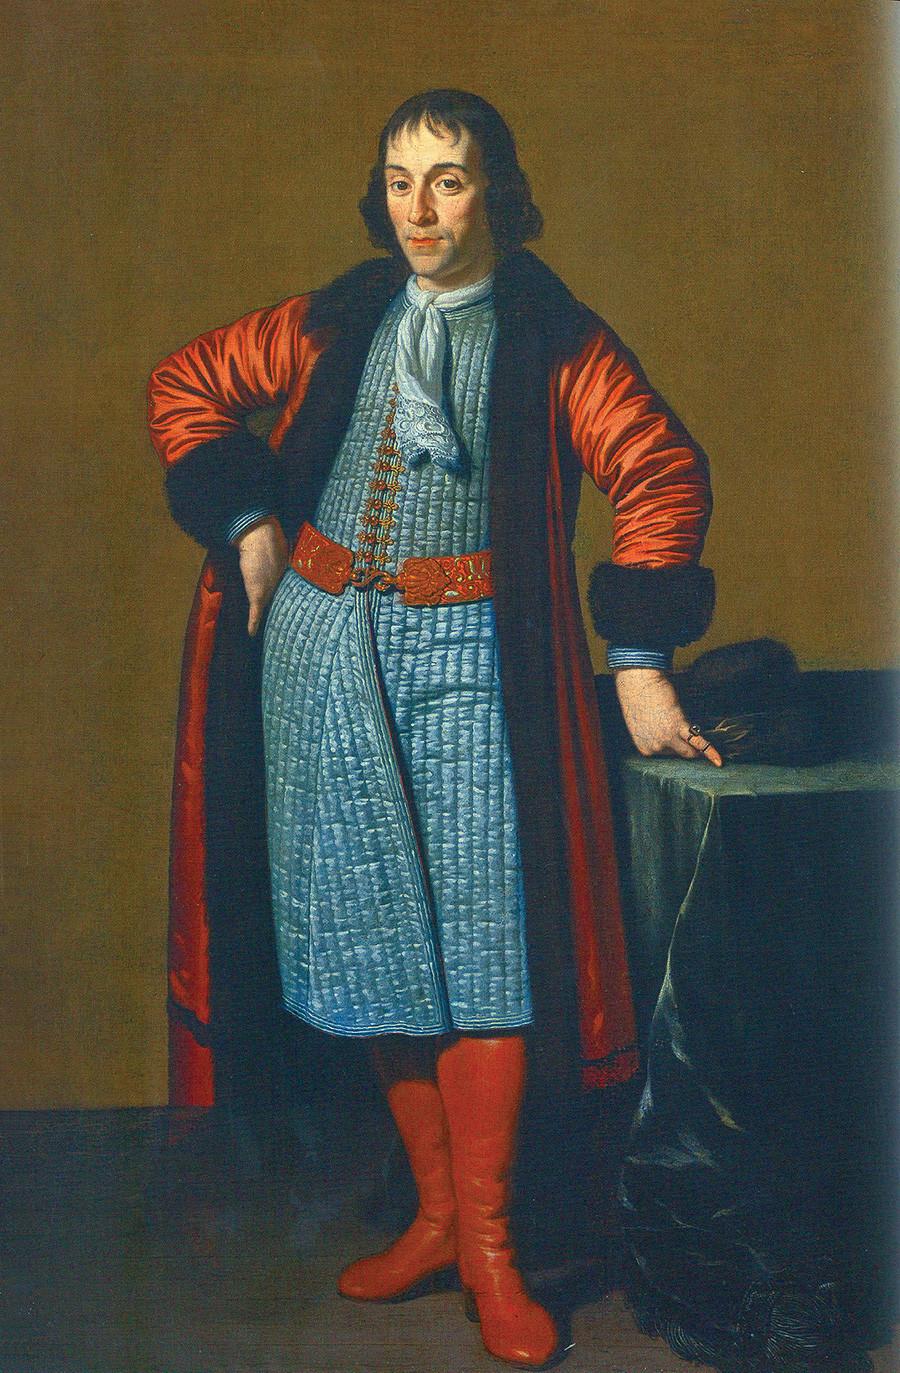 Potret Aleksandr Menshikov dilukis di Belanda mendampingi Pyotr yang Agung di Kedutaan Besar Rusia, karya Michiel van Musscher.